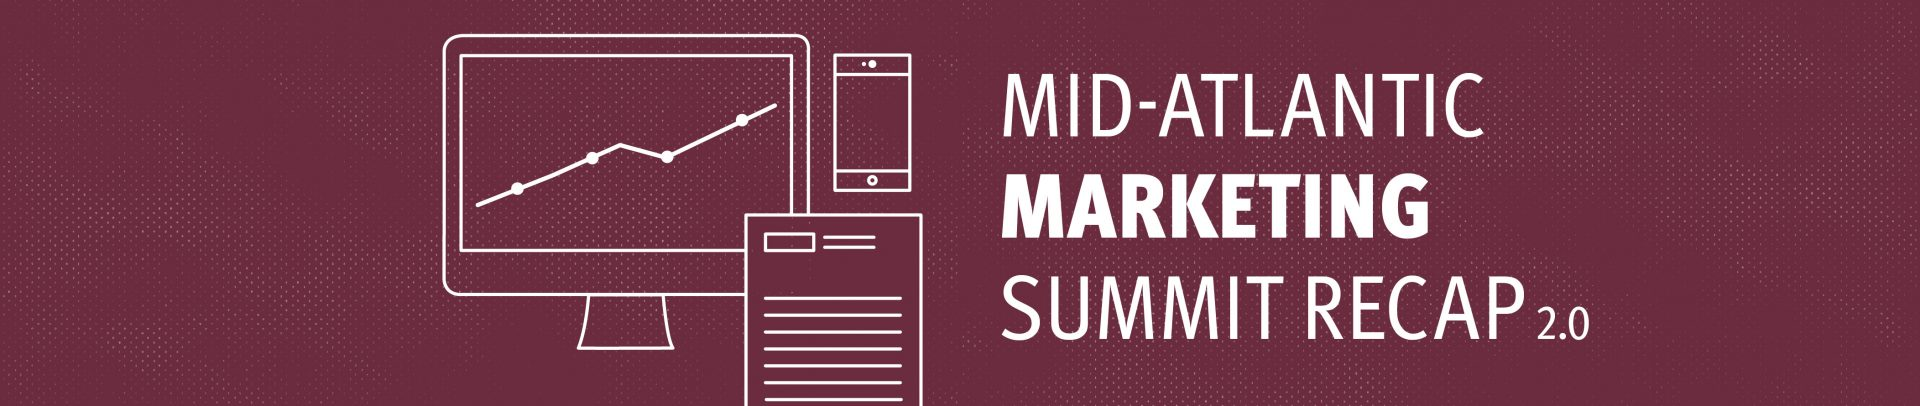 Mid Atlantic Marketing Summit